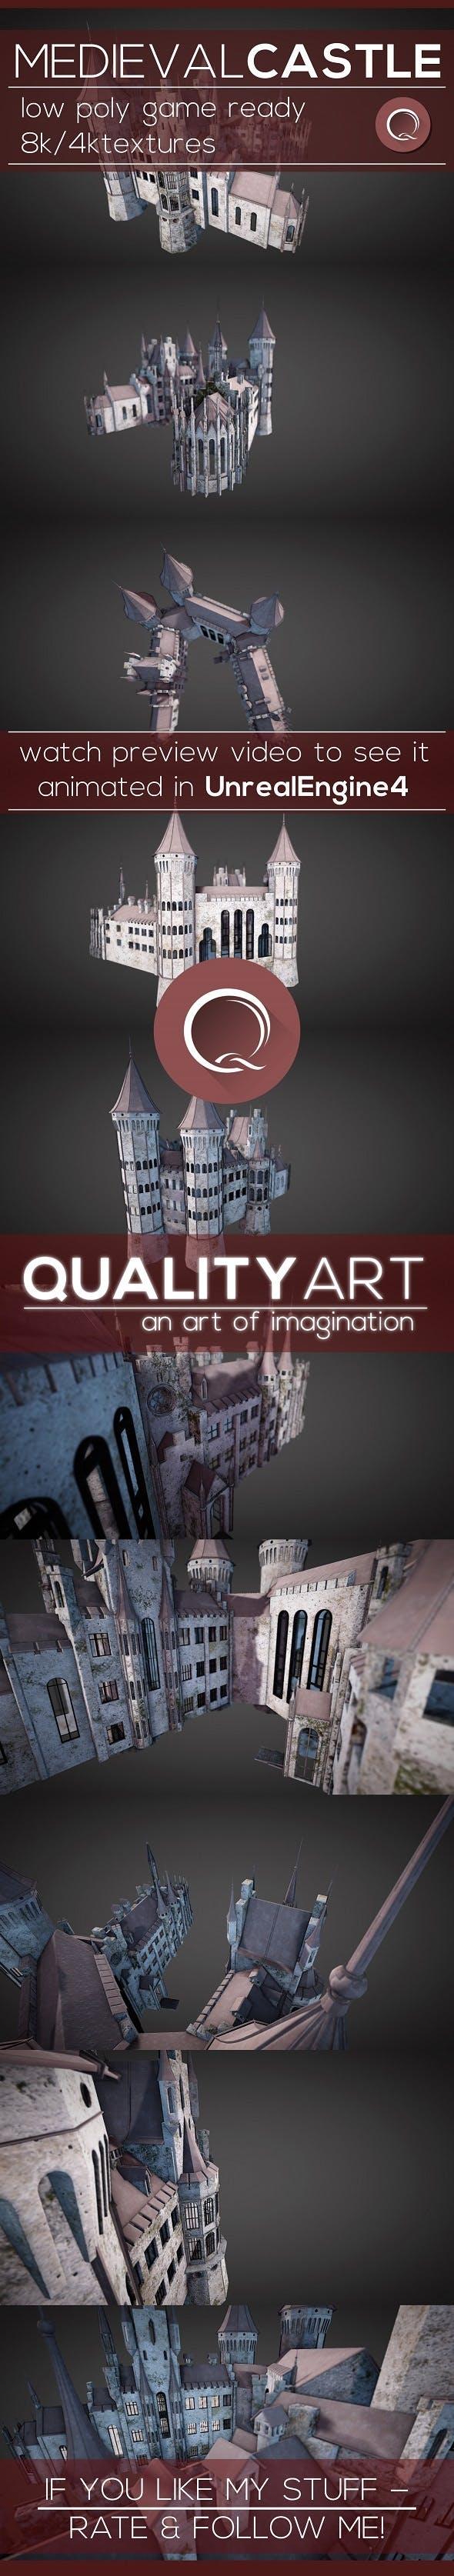 Low Poly Medieval Castle - Models Pack - 3DOcean Item for Sale